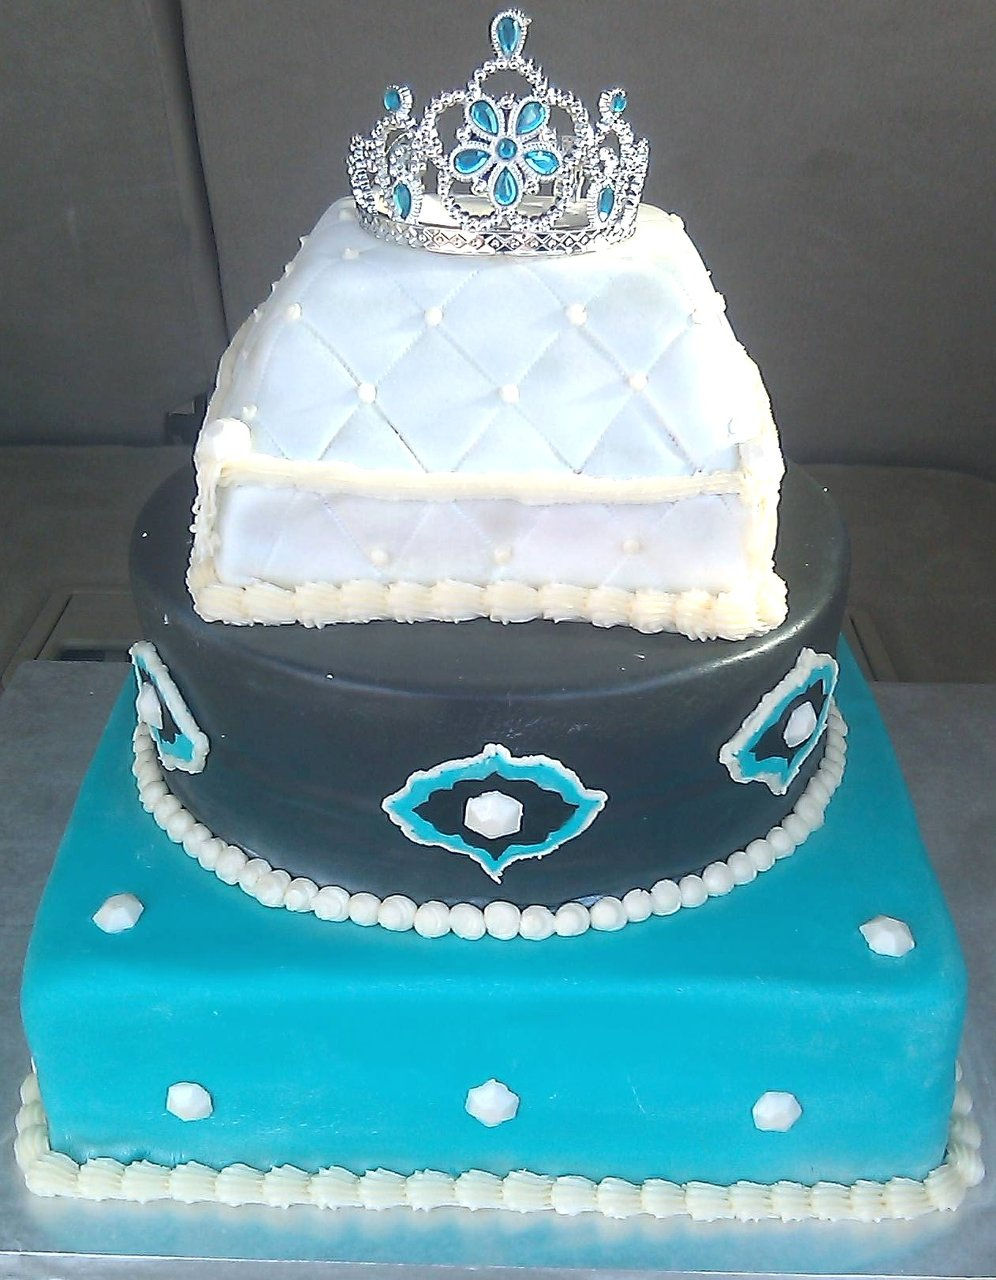 Design Your Own Sweet 16 Cake : M C Custom Cakes - Grants, NM Wix.com